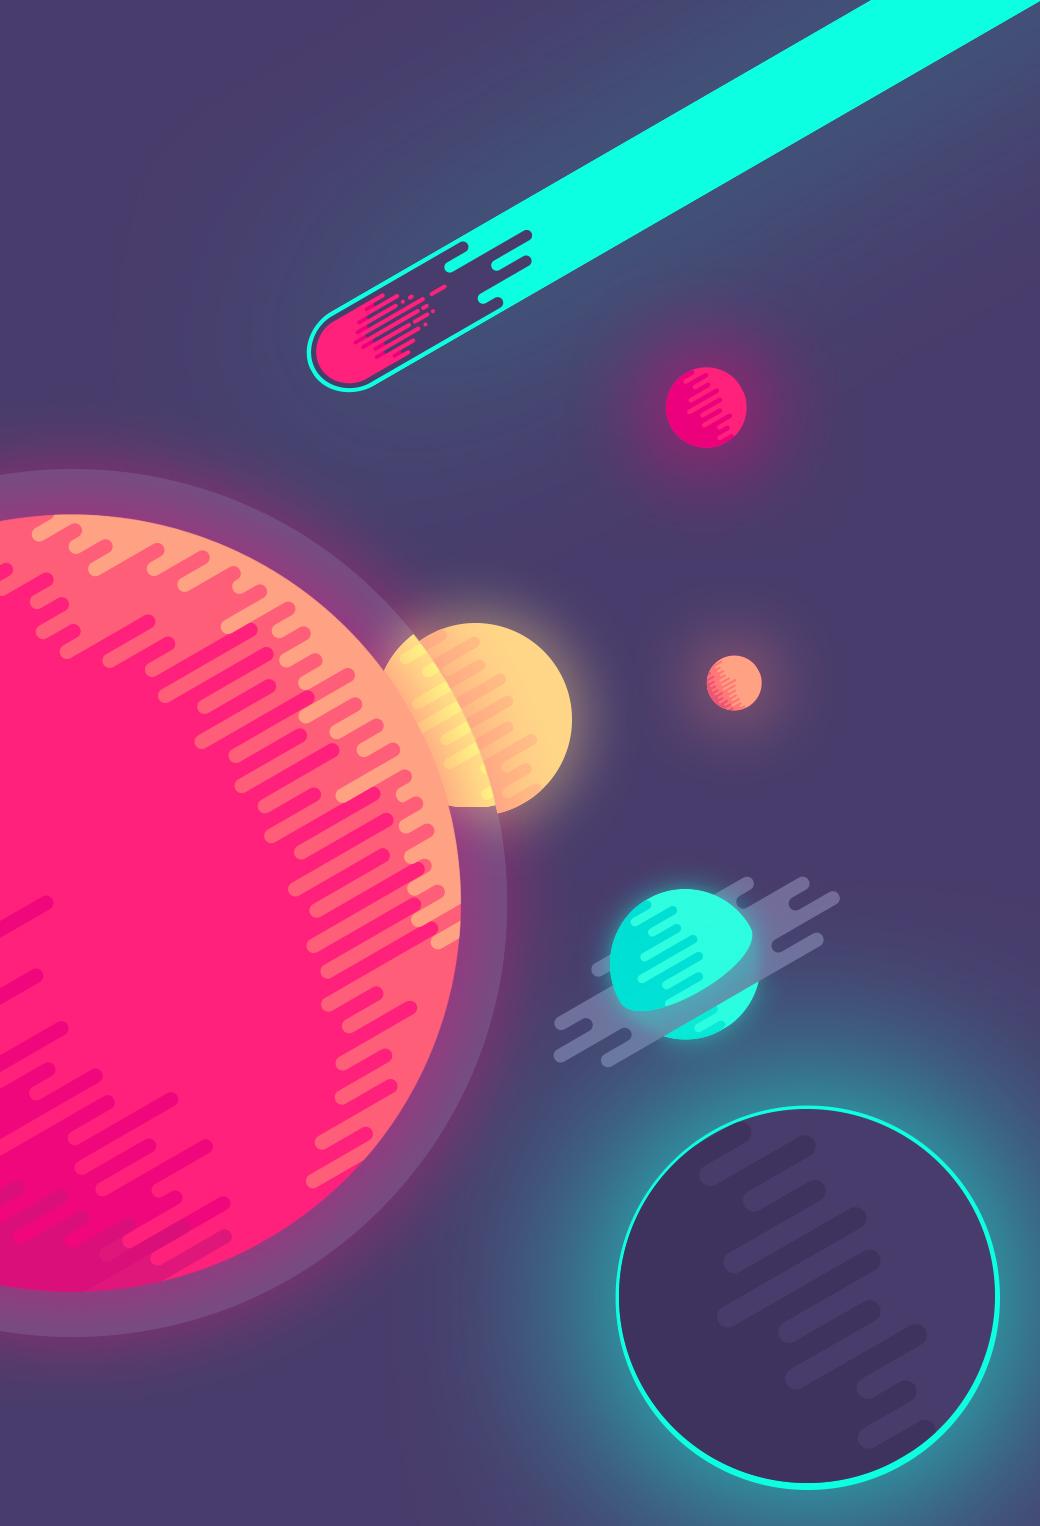 wallpaper of the week by nina geometrieva